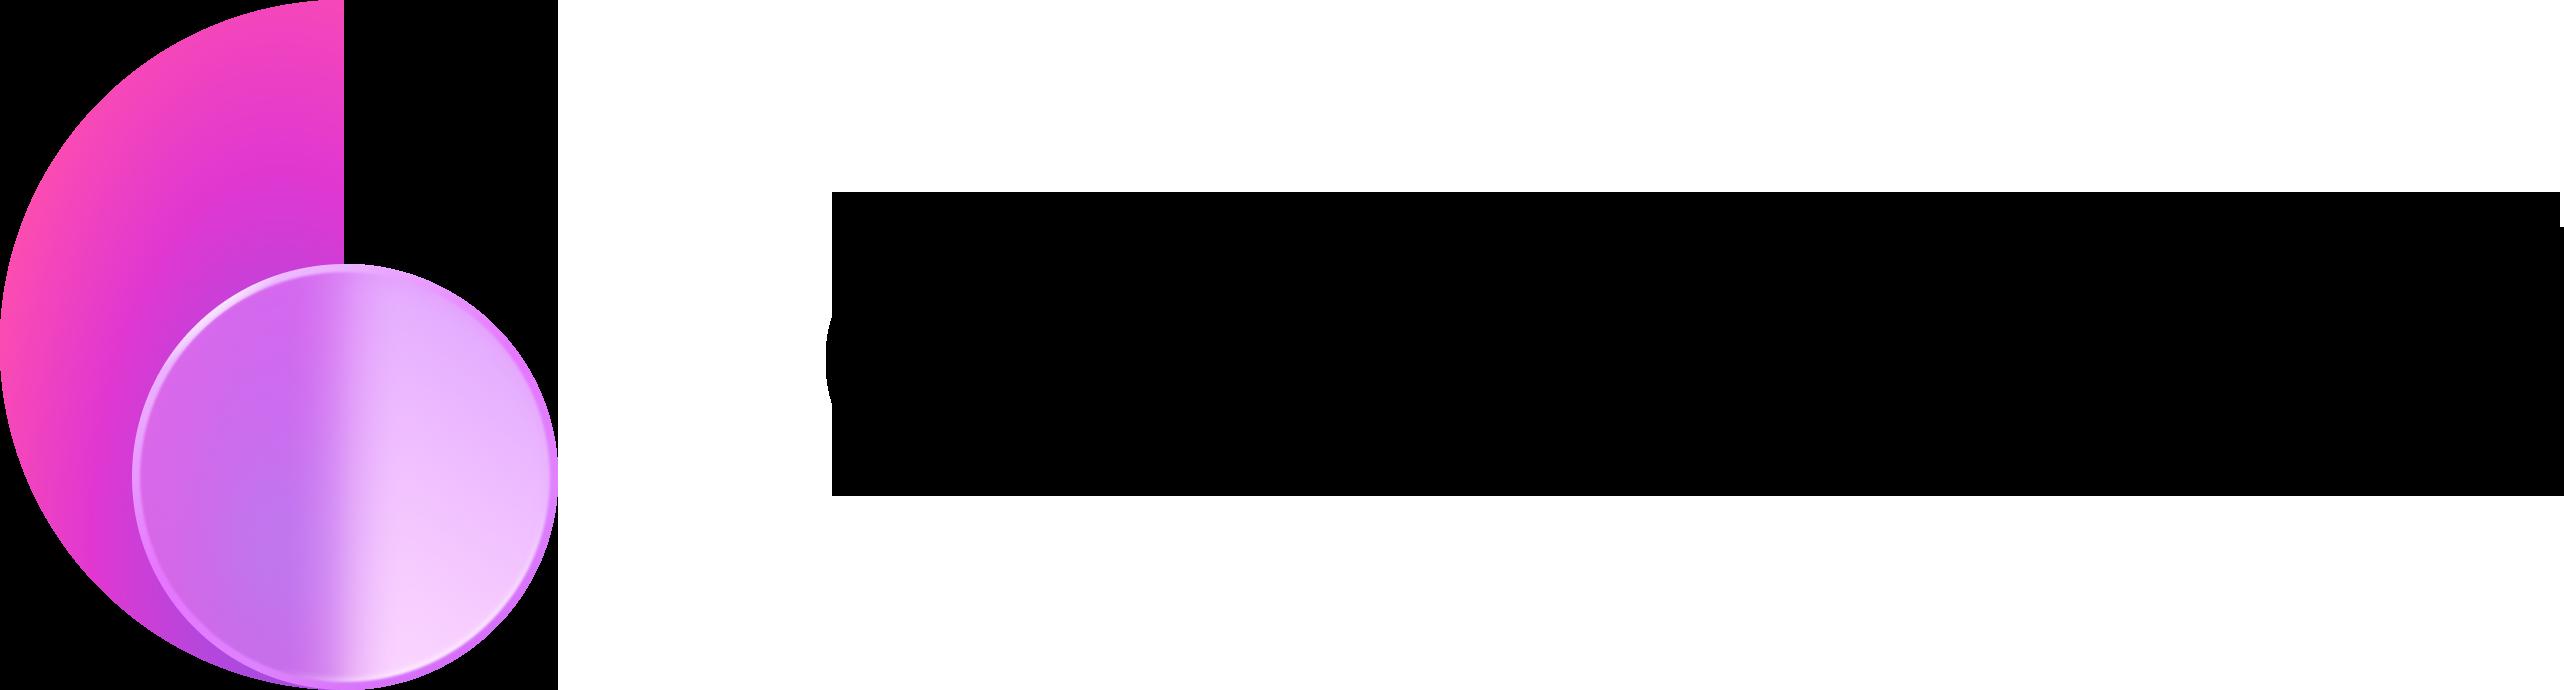 clearvpn logo